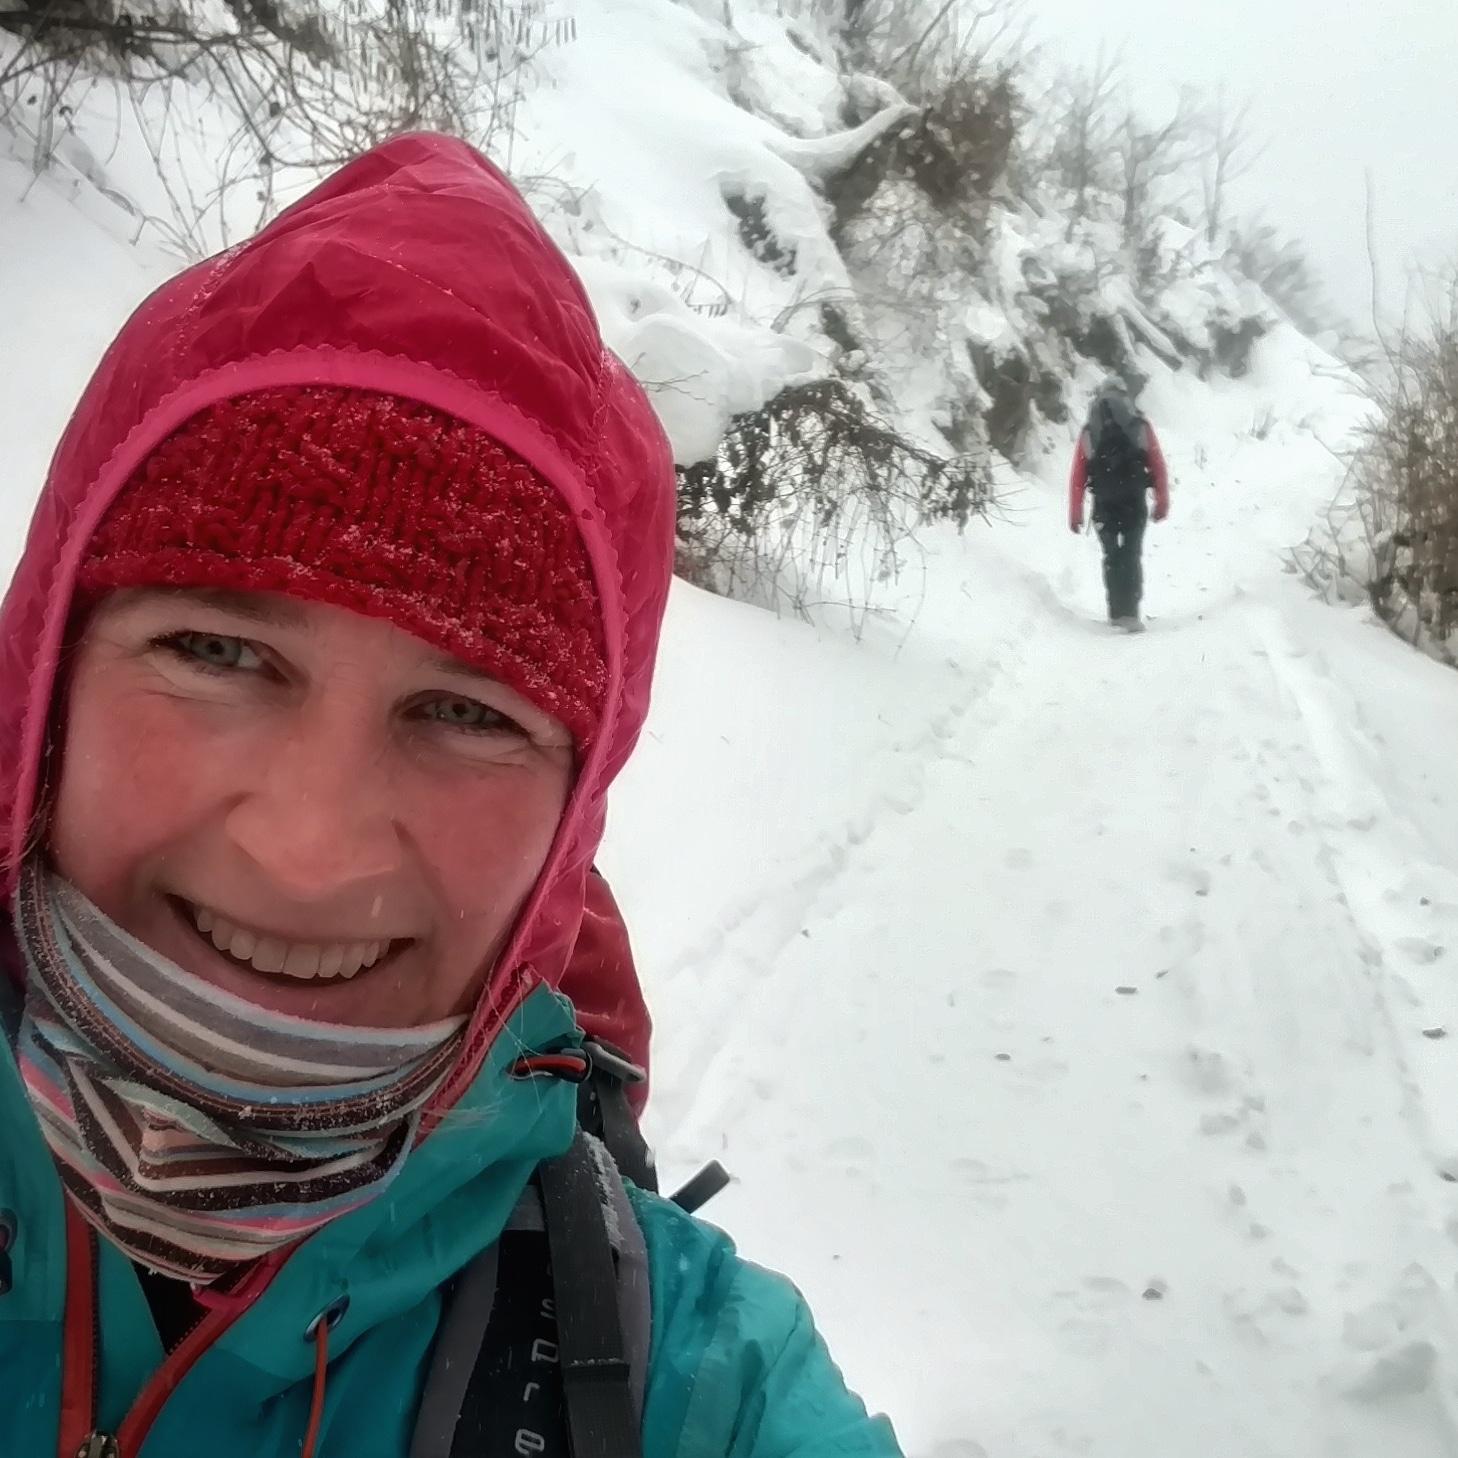 White Medvedinica Winter Walk | Looking back on February